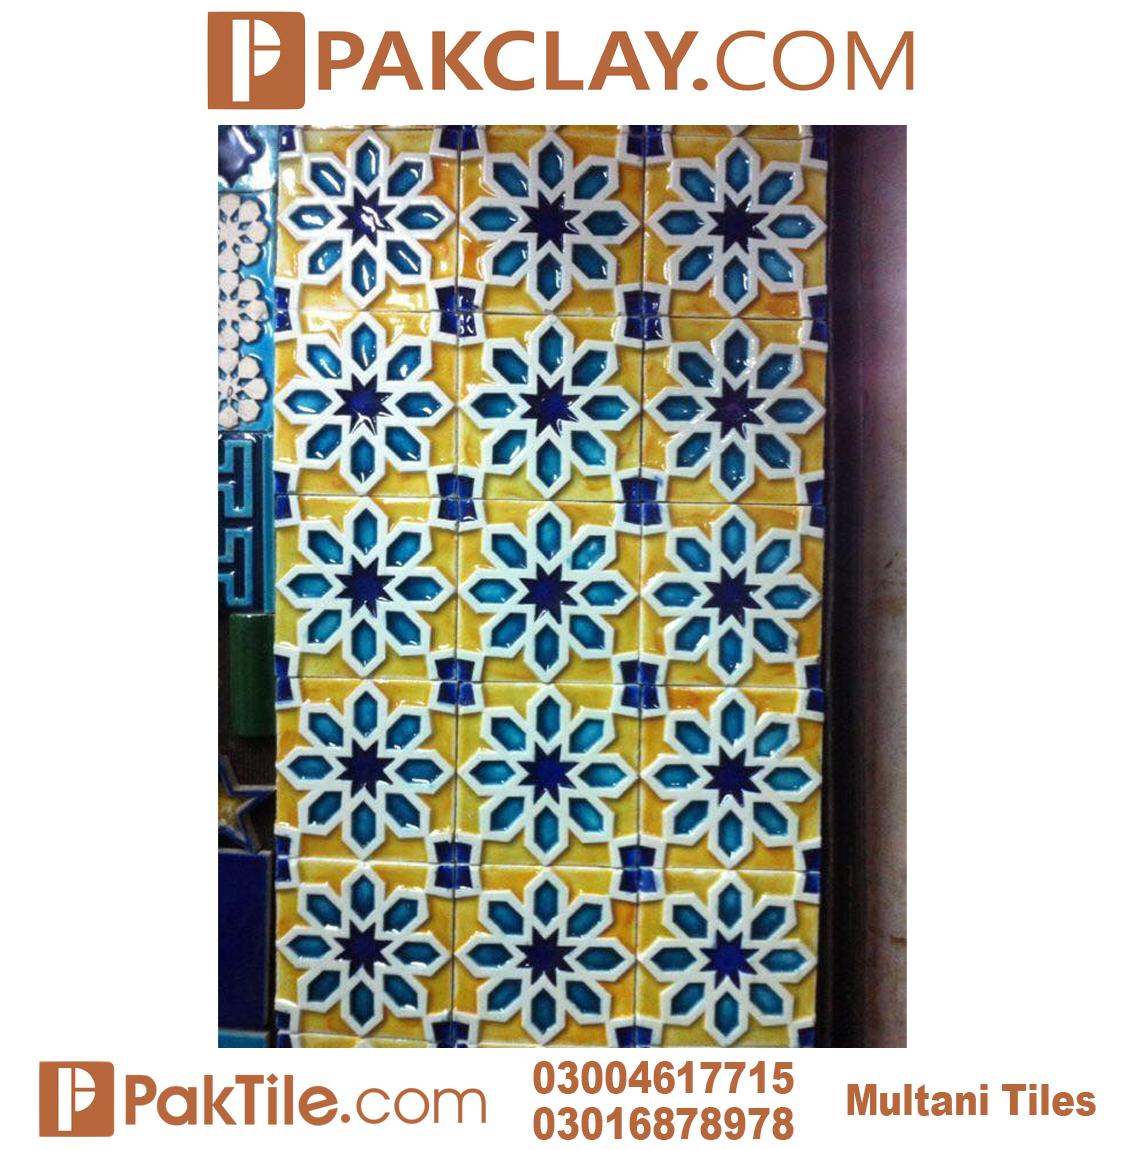 Pak clay wall tiles shop online multani tiles price